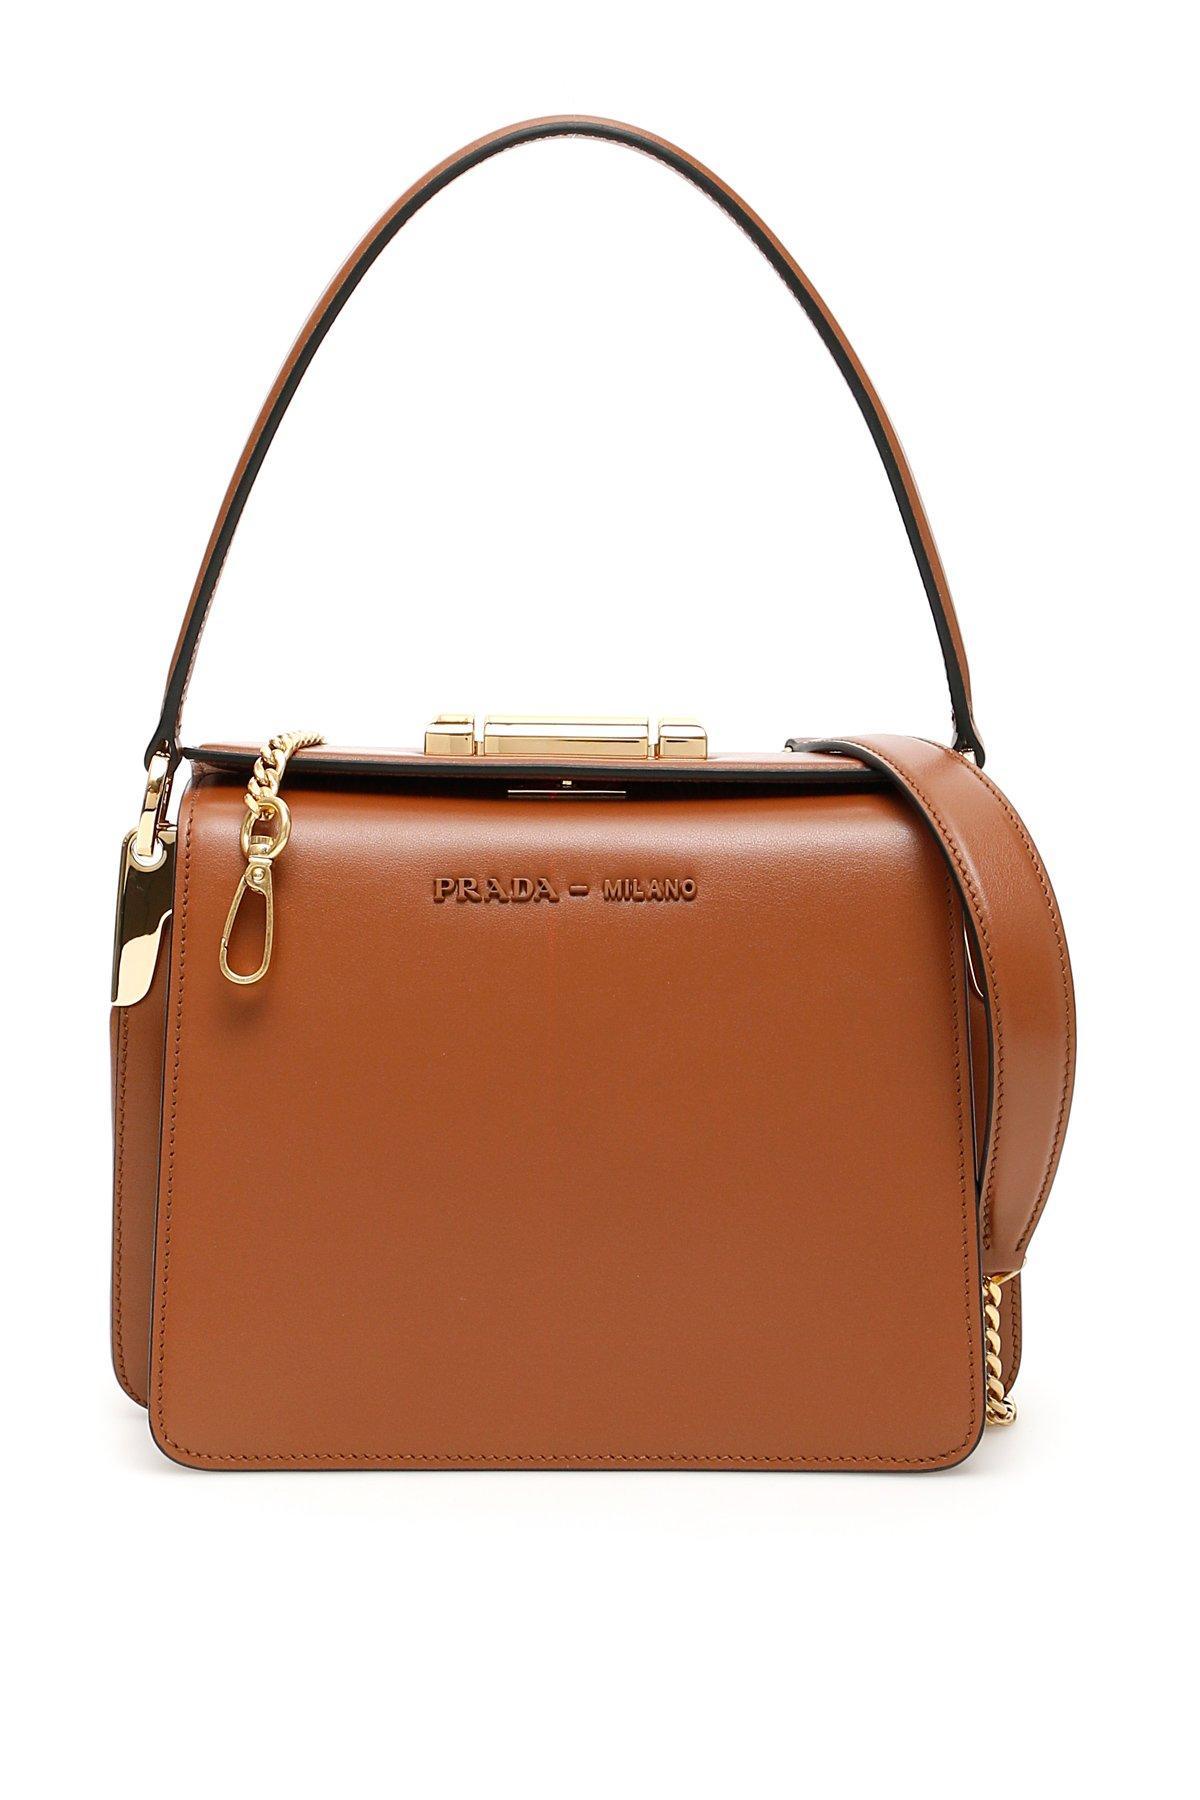 9fc31b86 Prada Sybille Top-handle Bag in Brown - Lyst